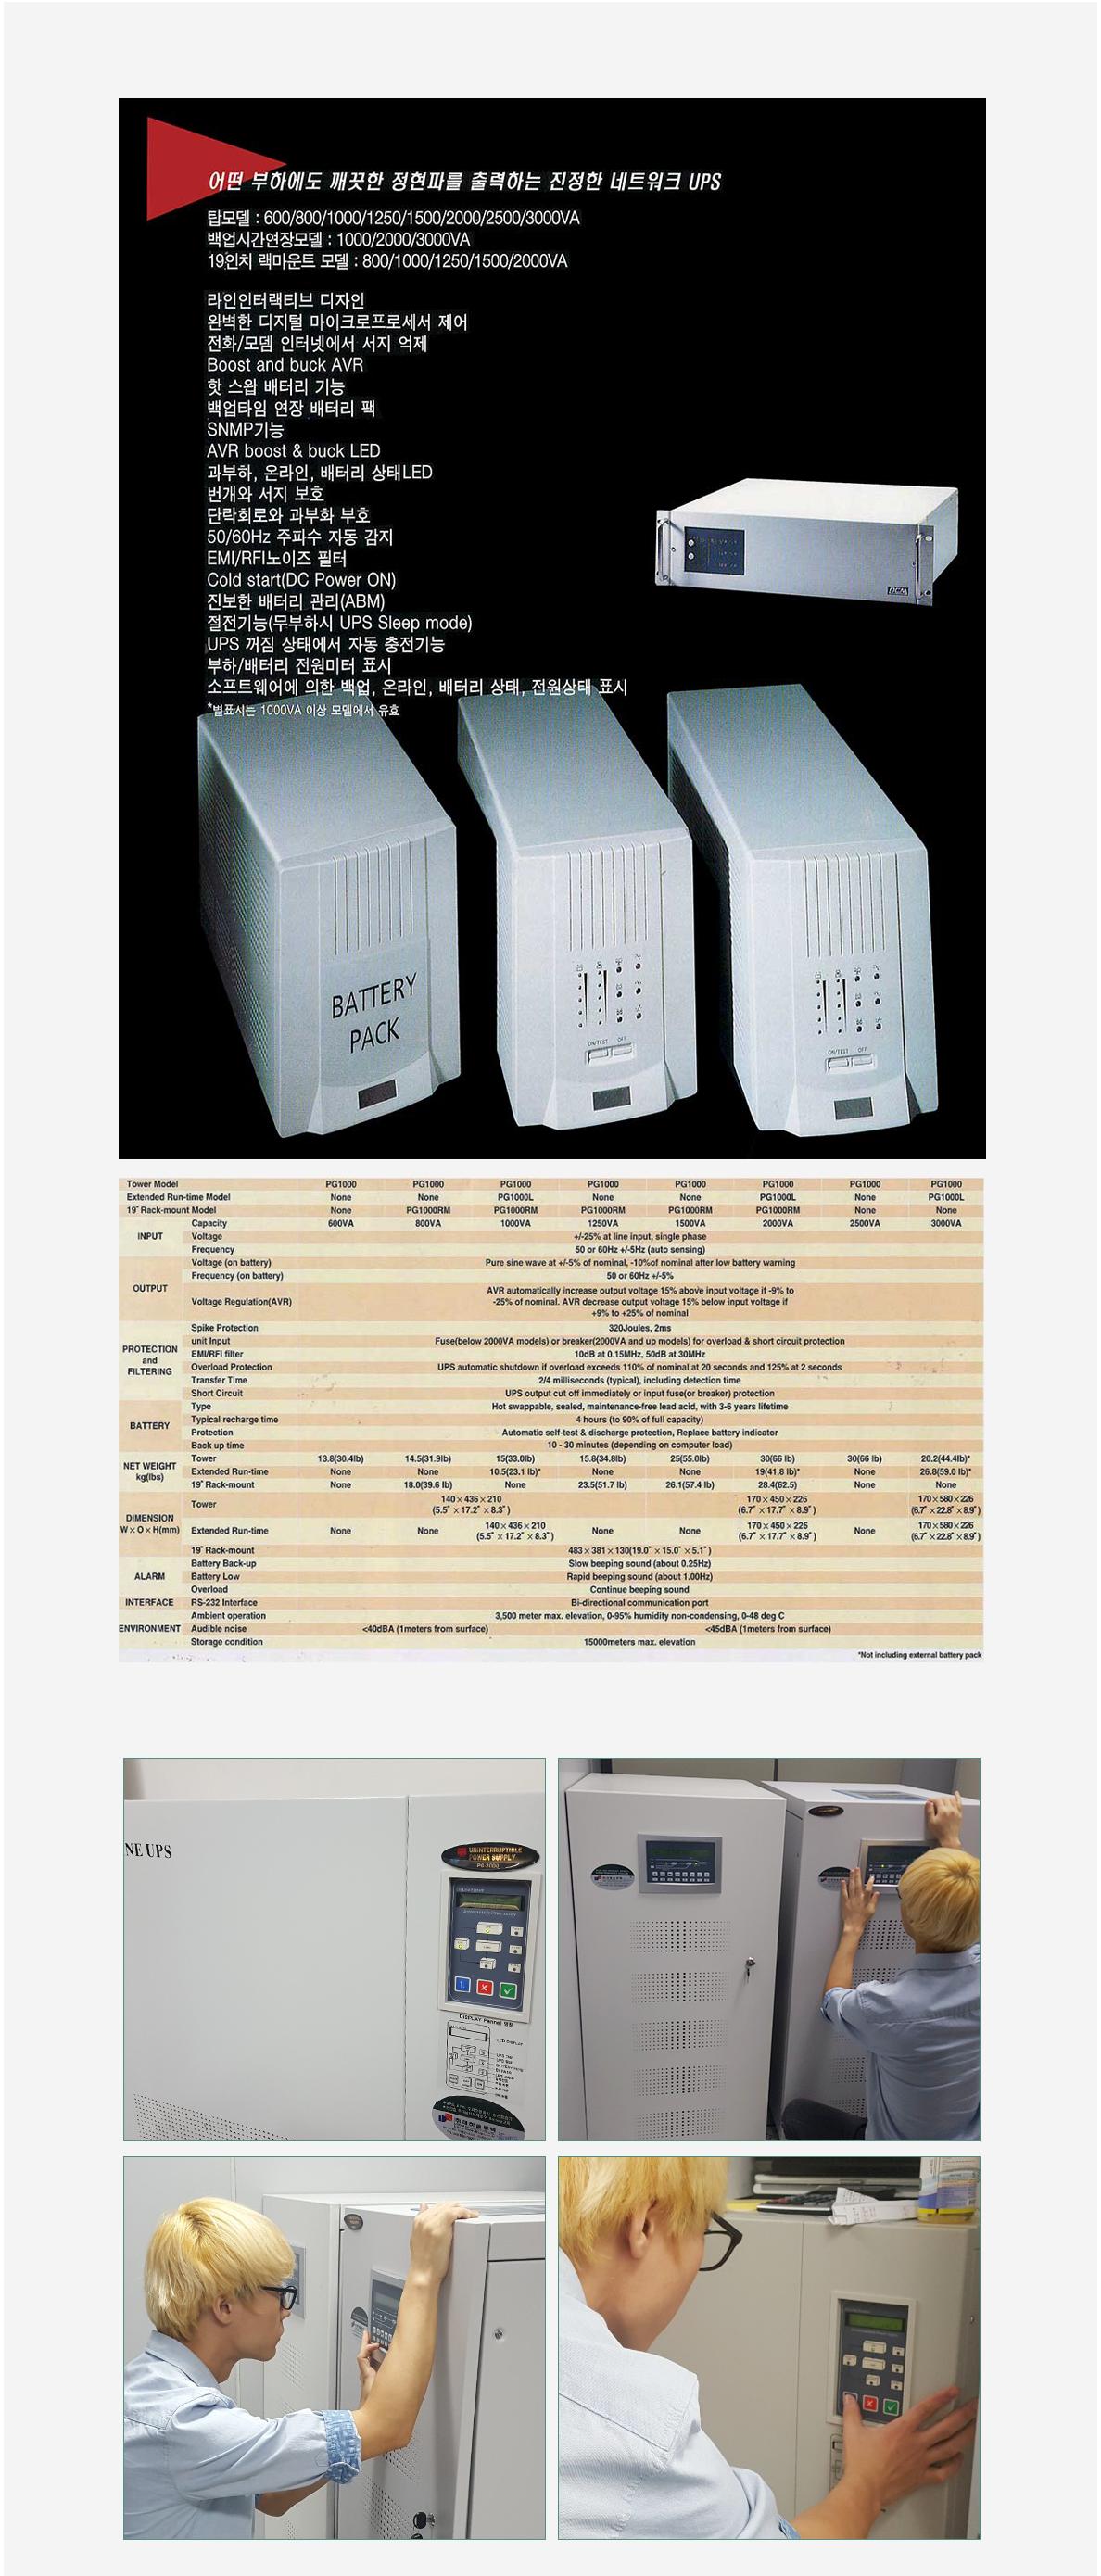 Daeha Solutech UPS (Uninterruptible Power Supply) PG-Series 3